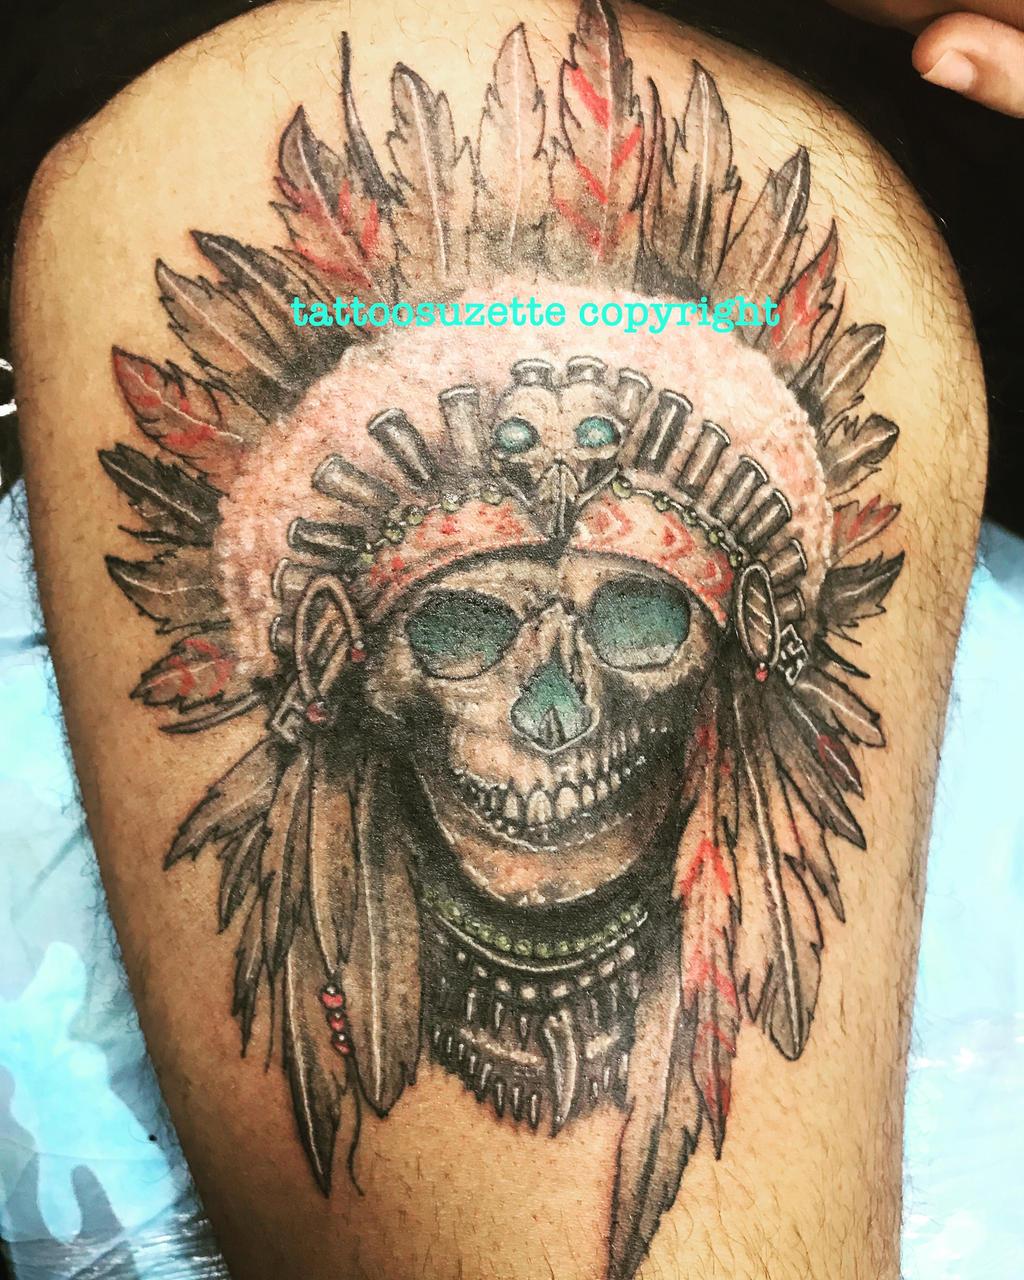 Modele tatouage tete de mort fashion designs - Signification tatouage tete de mort ...